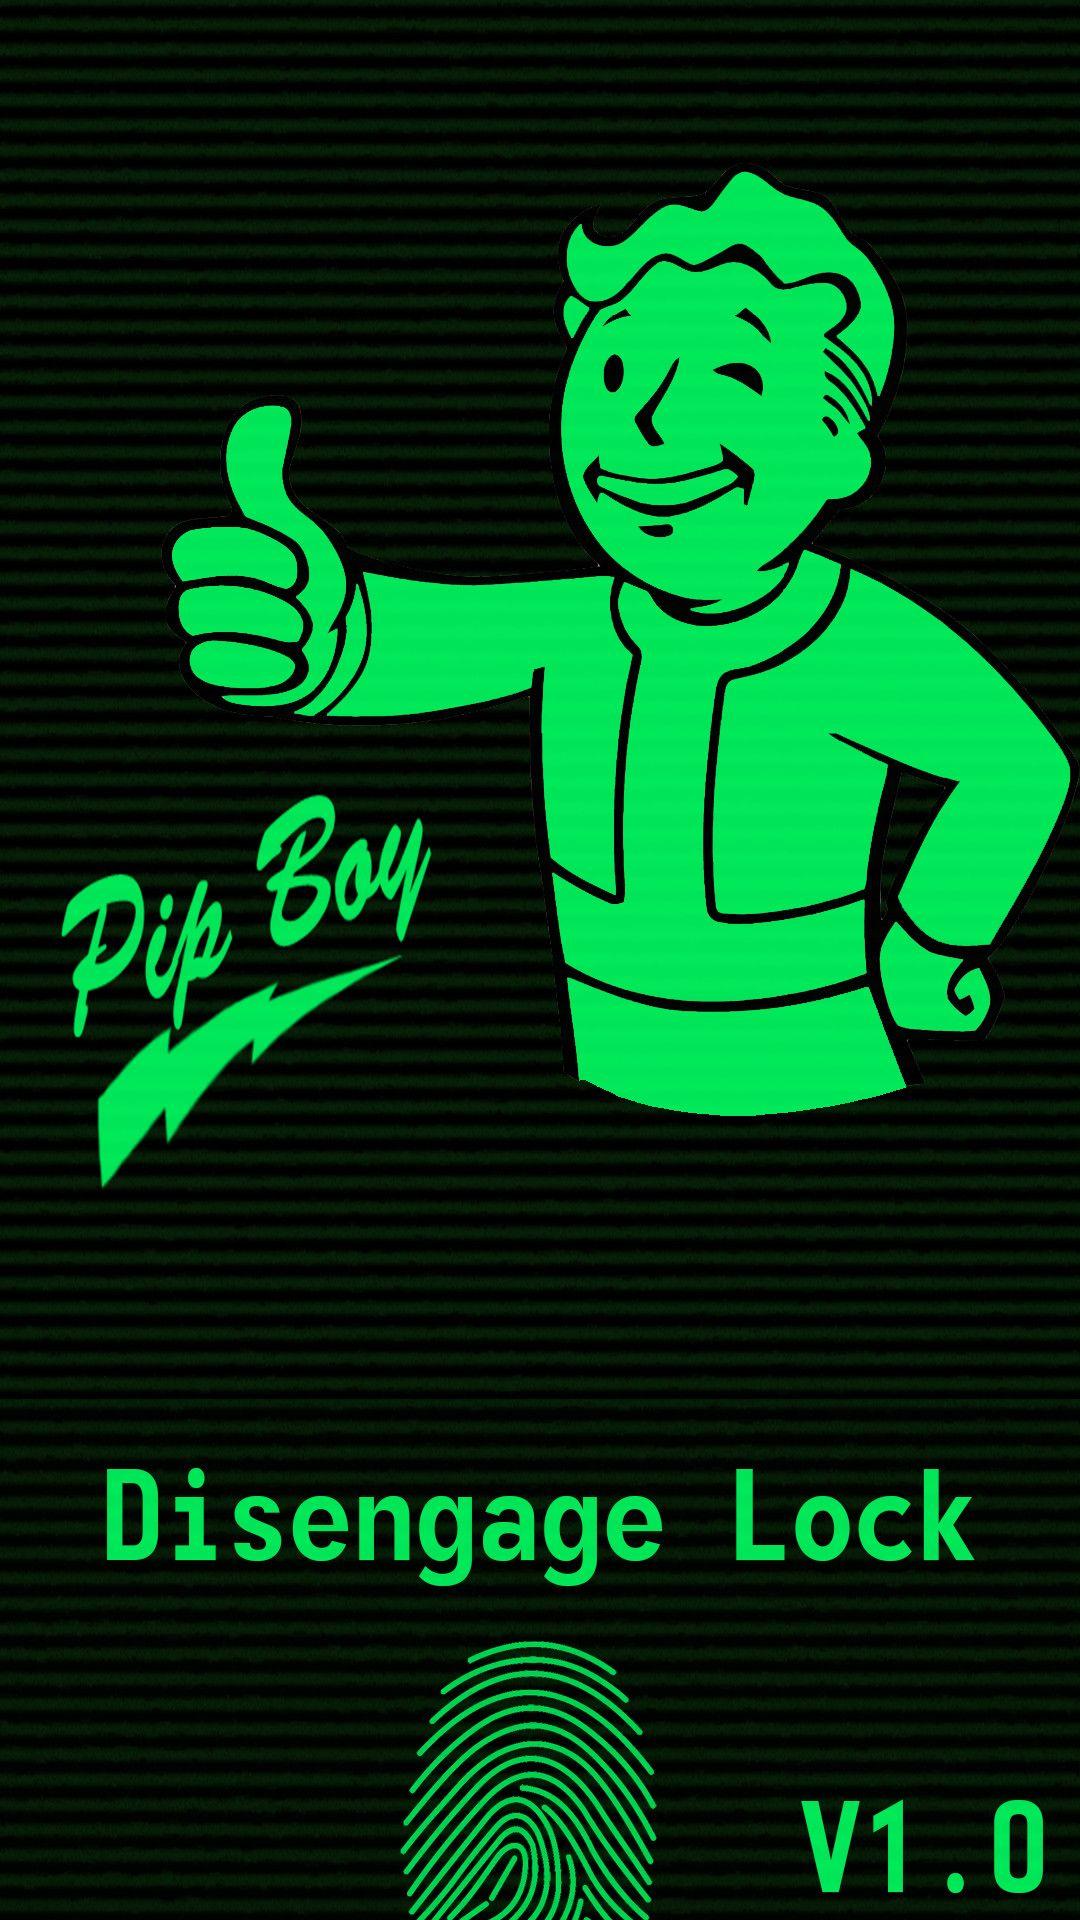 Fallout Pip Boy Iphone Wallpaper